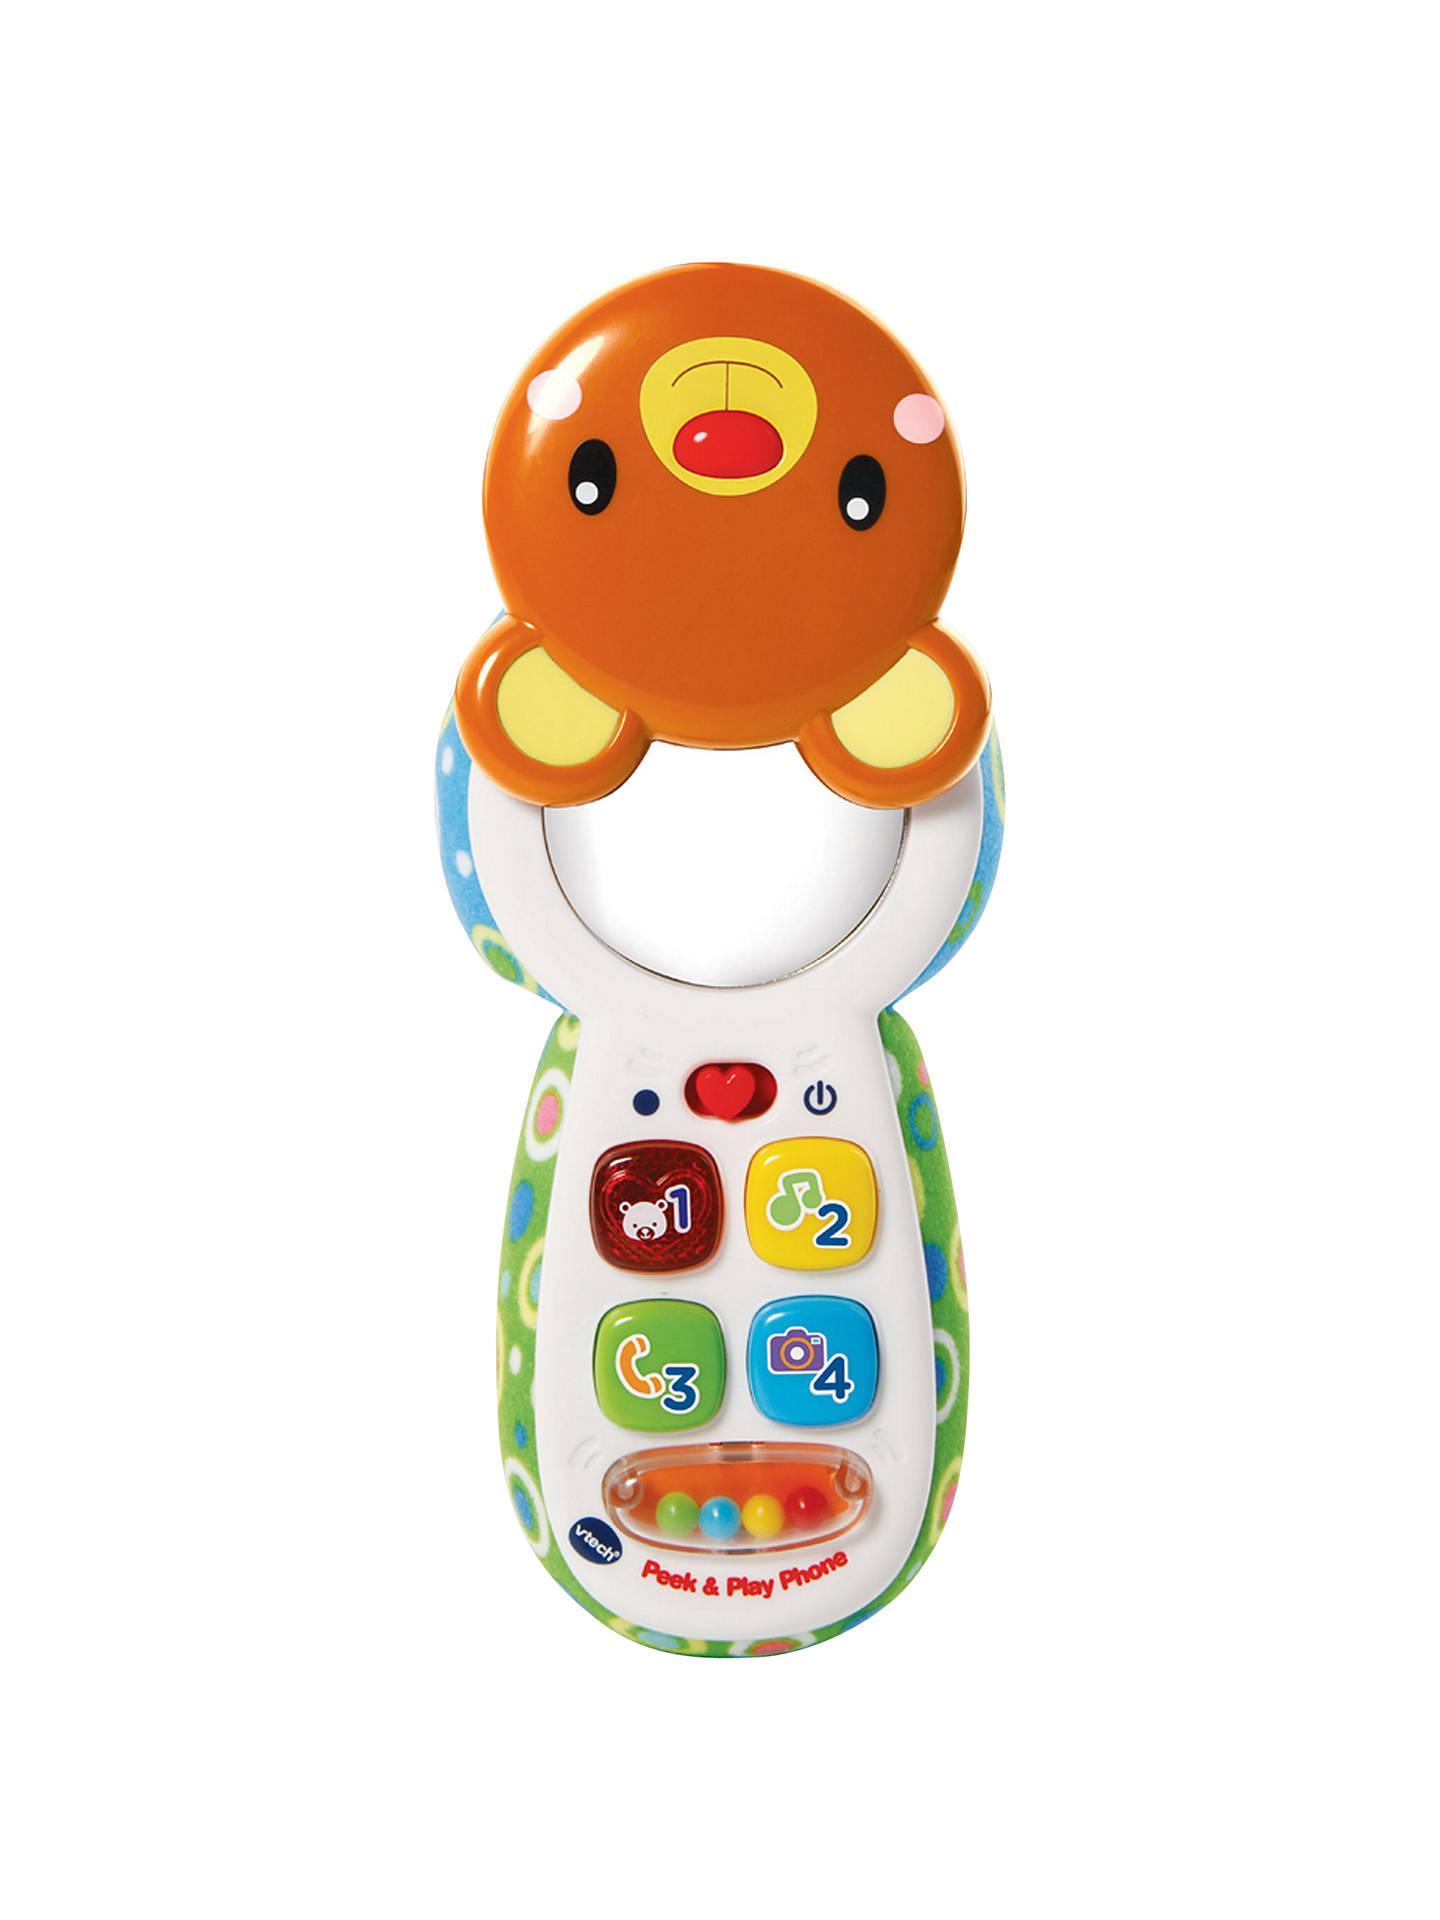 Vtech Peek Play Phone Baby Toy At John Lewis Partners